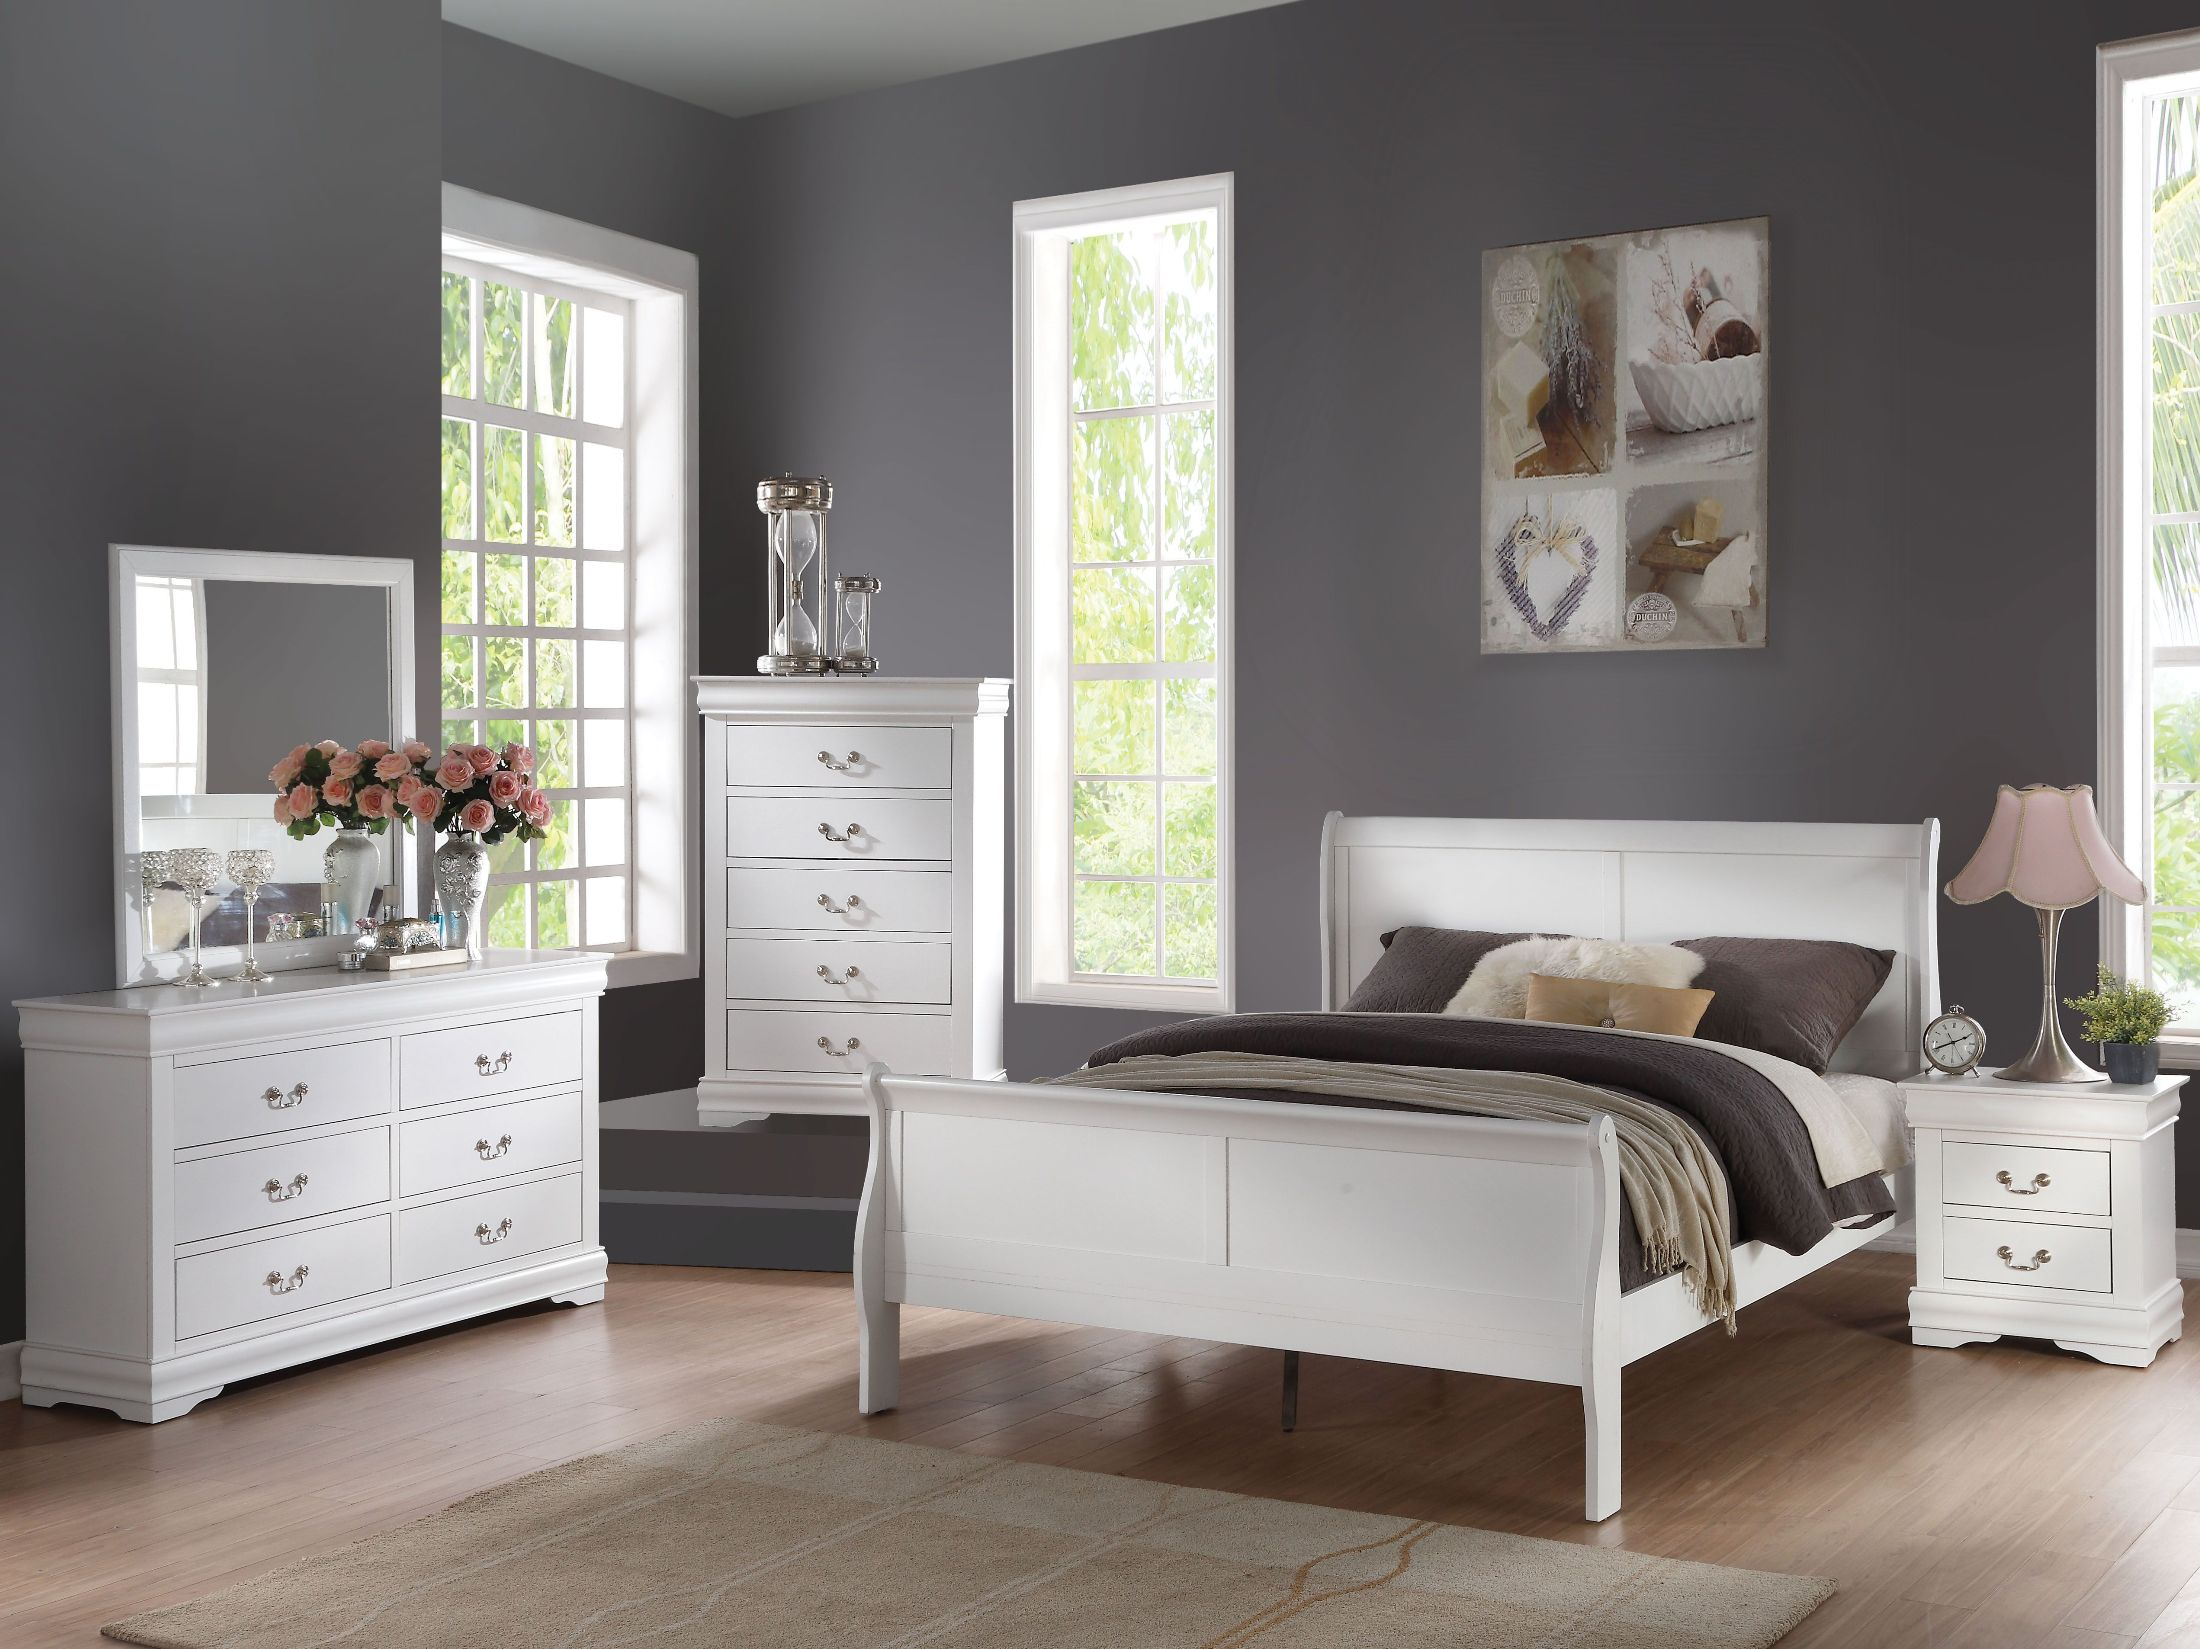 Acme louis philippe white sleigh bedroom set louis - Louis philippe bedroom collection ...